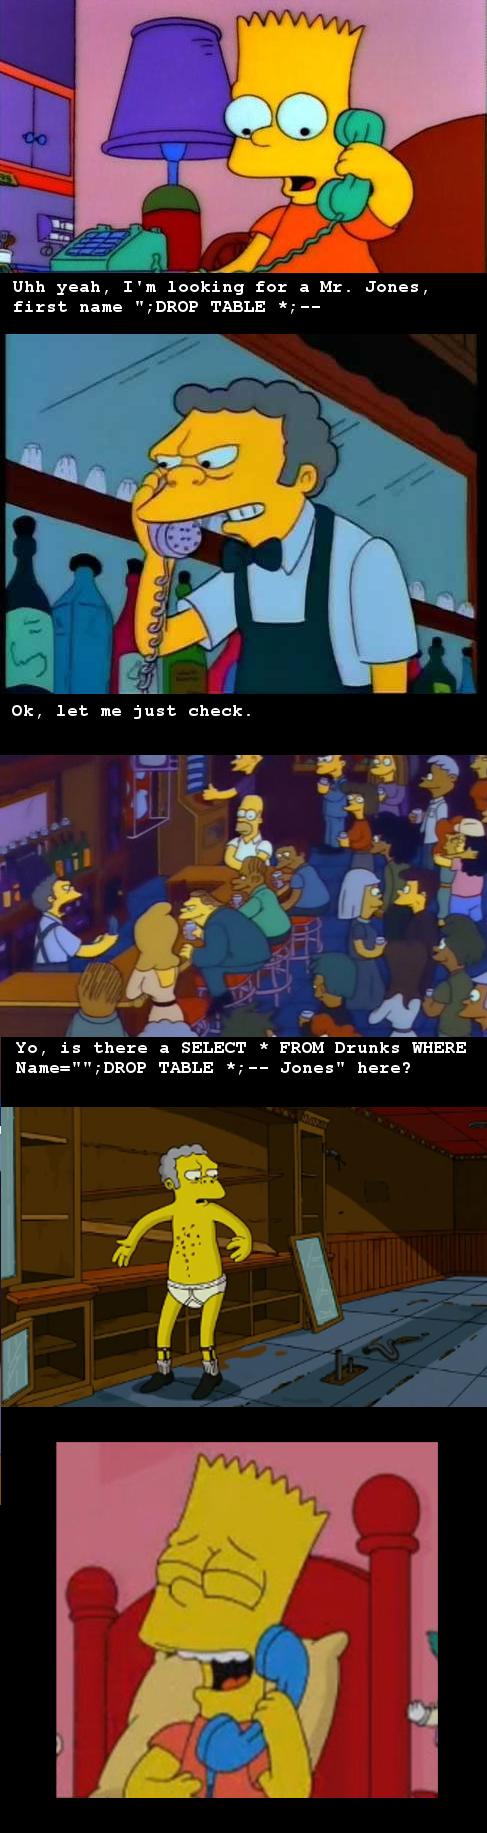 Sql injection in a nutshell | sql-memes, shell-memes | ProgrammerHumor.io